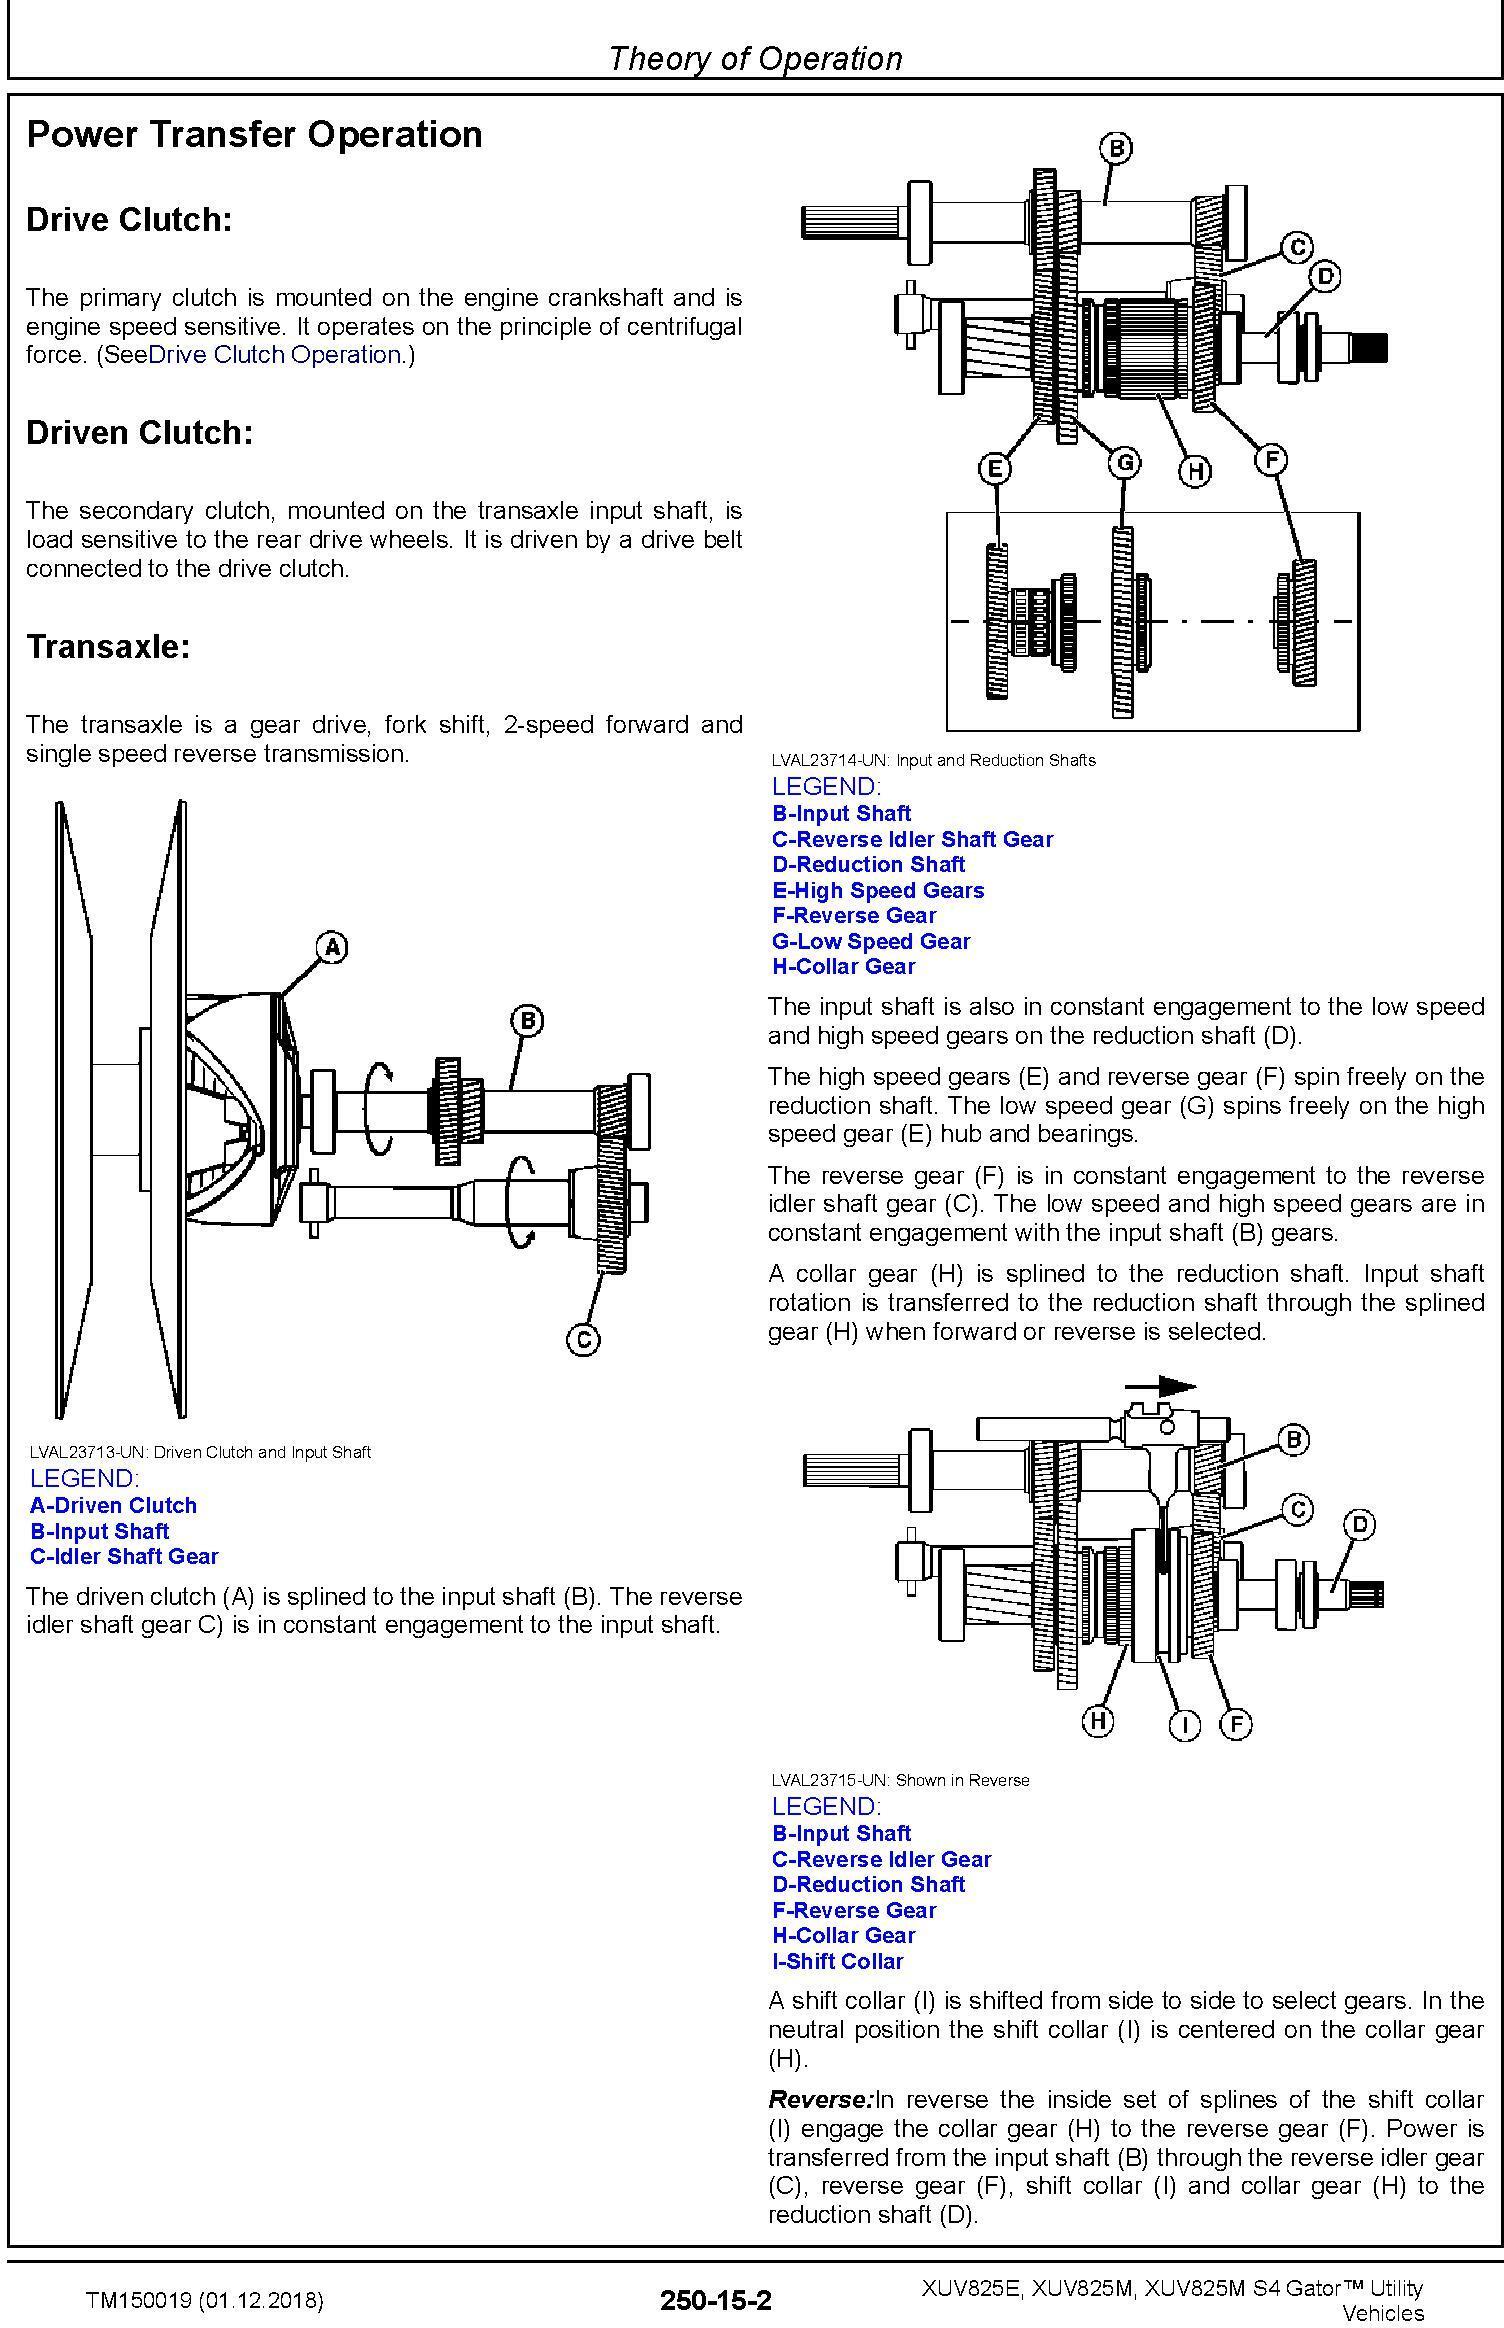 John Deere XUV825E XUV825M, XUV825M S4 Gator Utility Vehicles (SN.010001-) Technical Manual TM150019 - 3